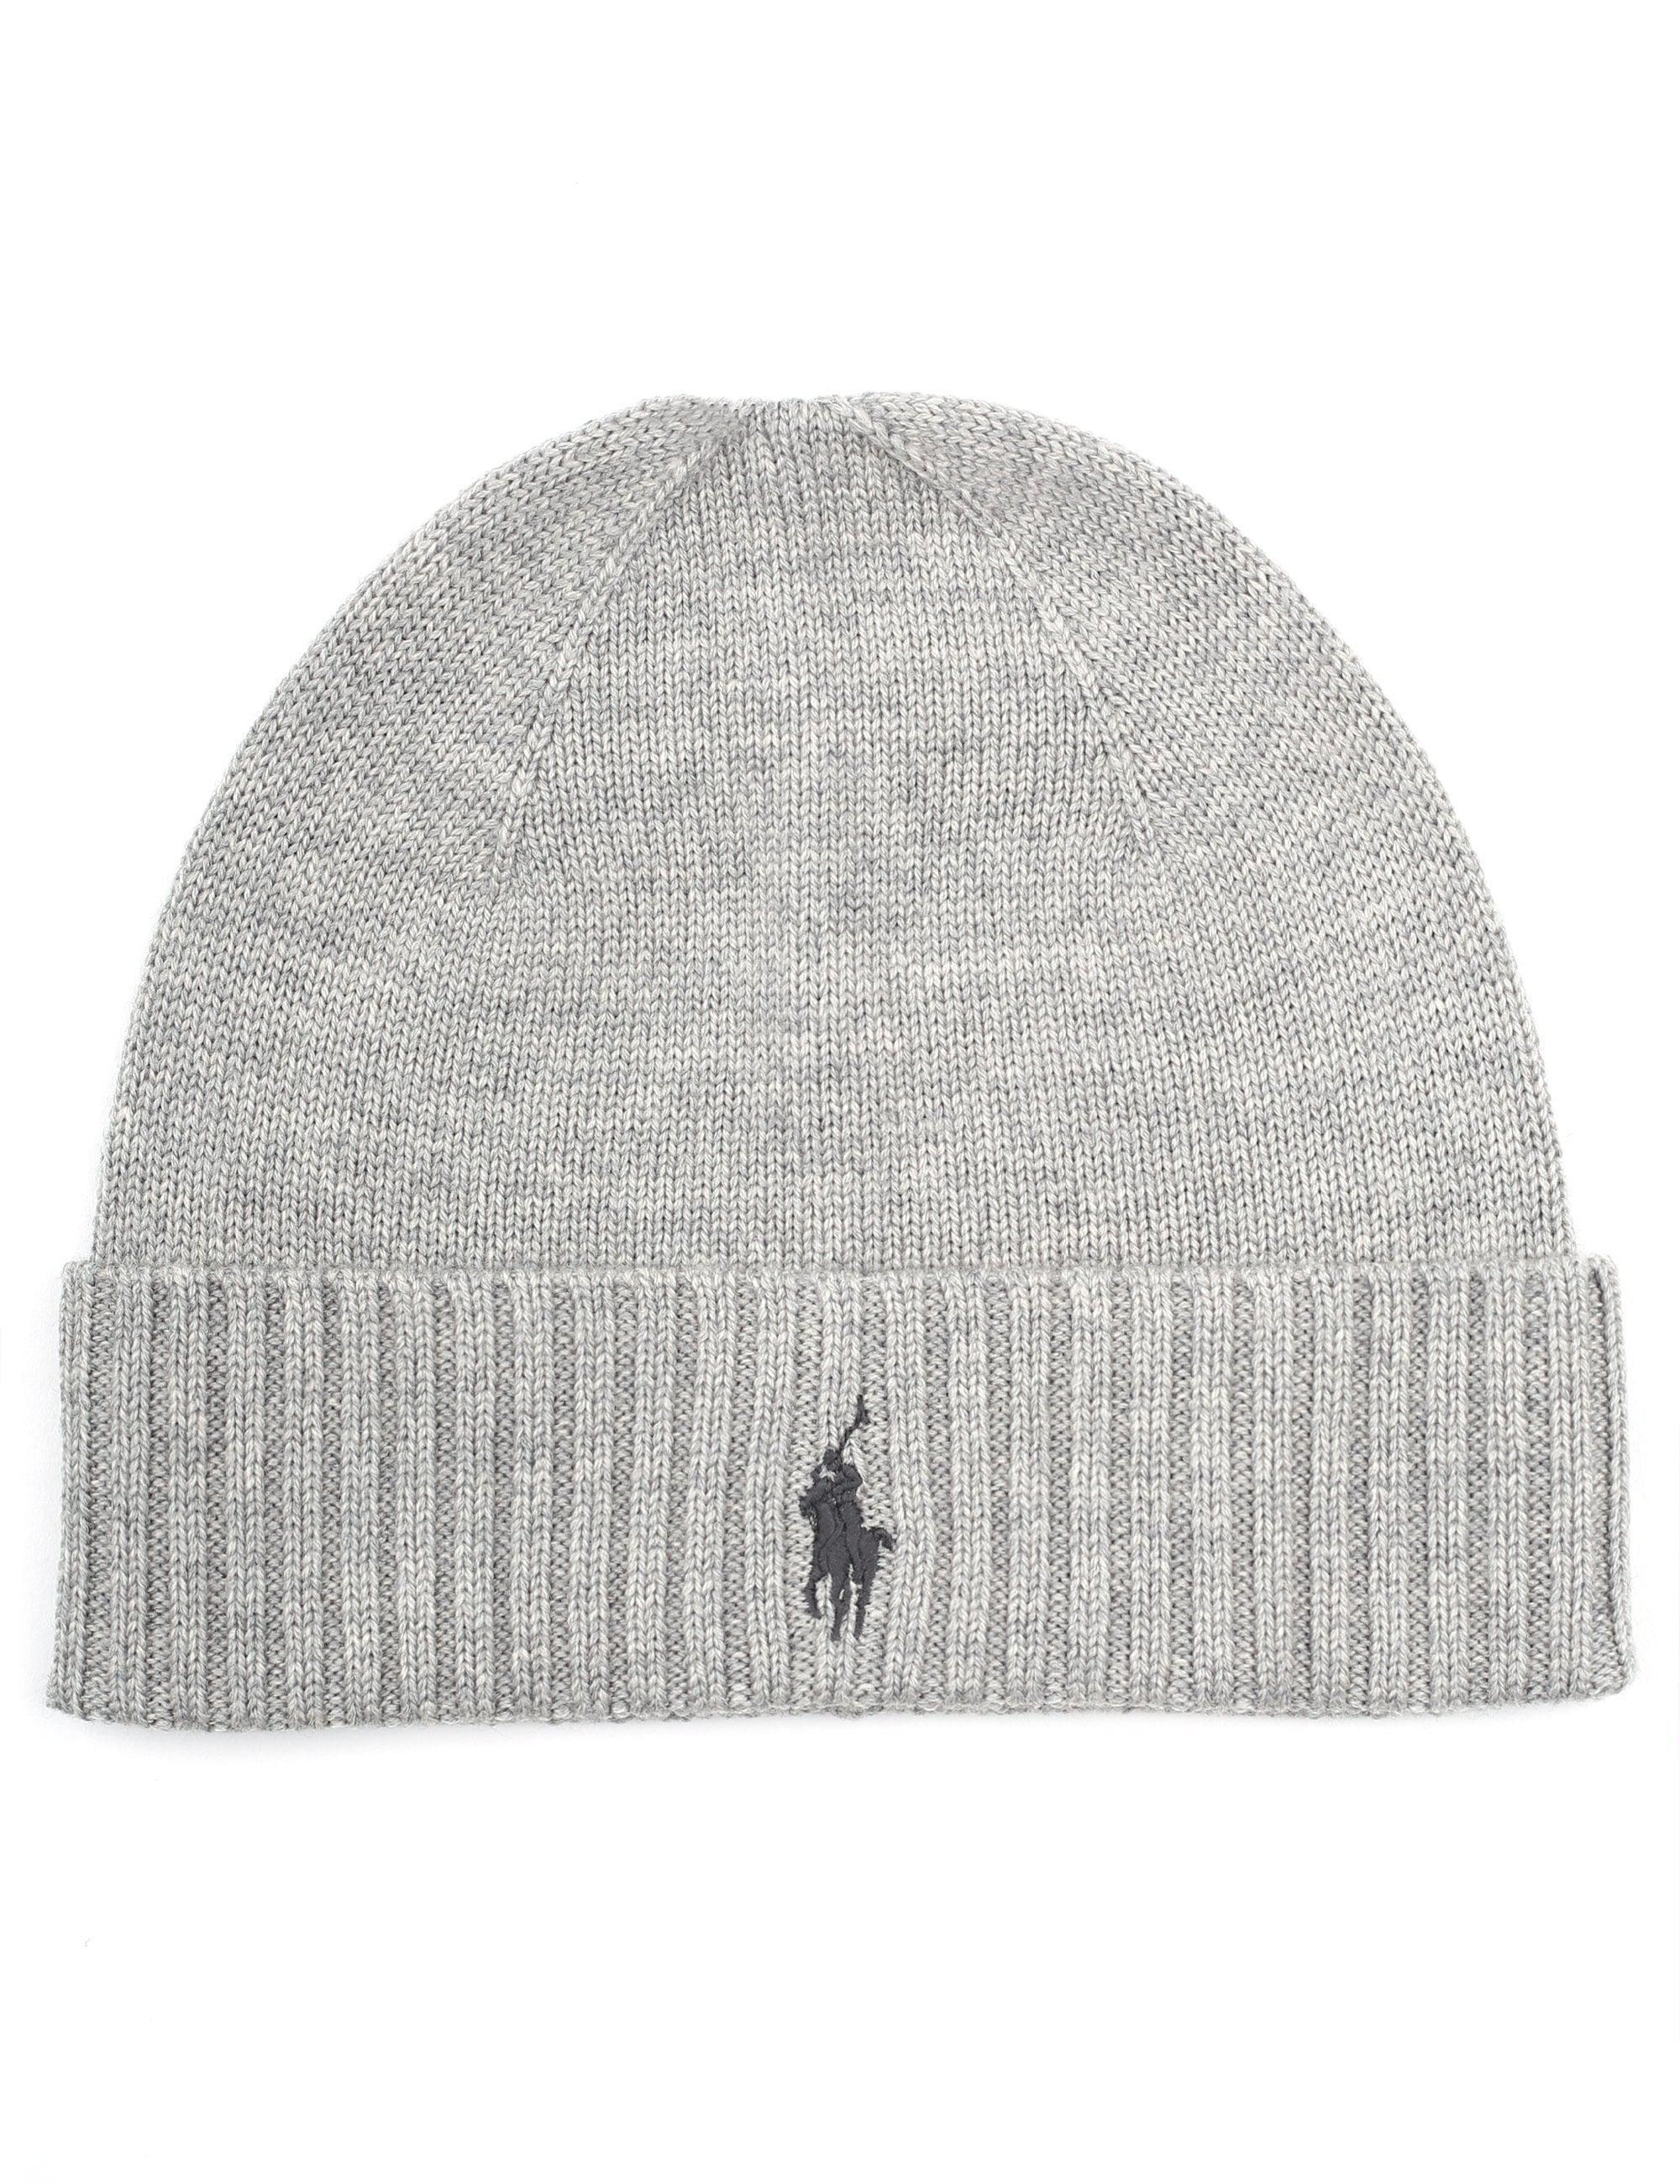 ecc59619e70 Polo Ralph Lauren Men s Fo Beanie Hat Grey in Gray for Men - Lyst